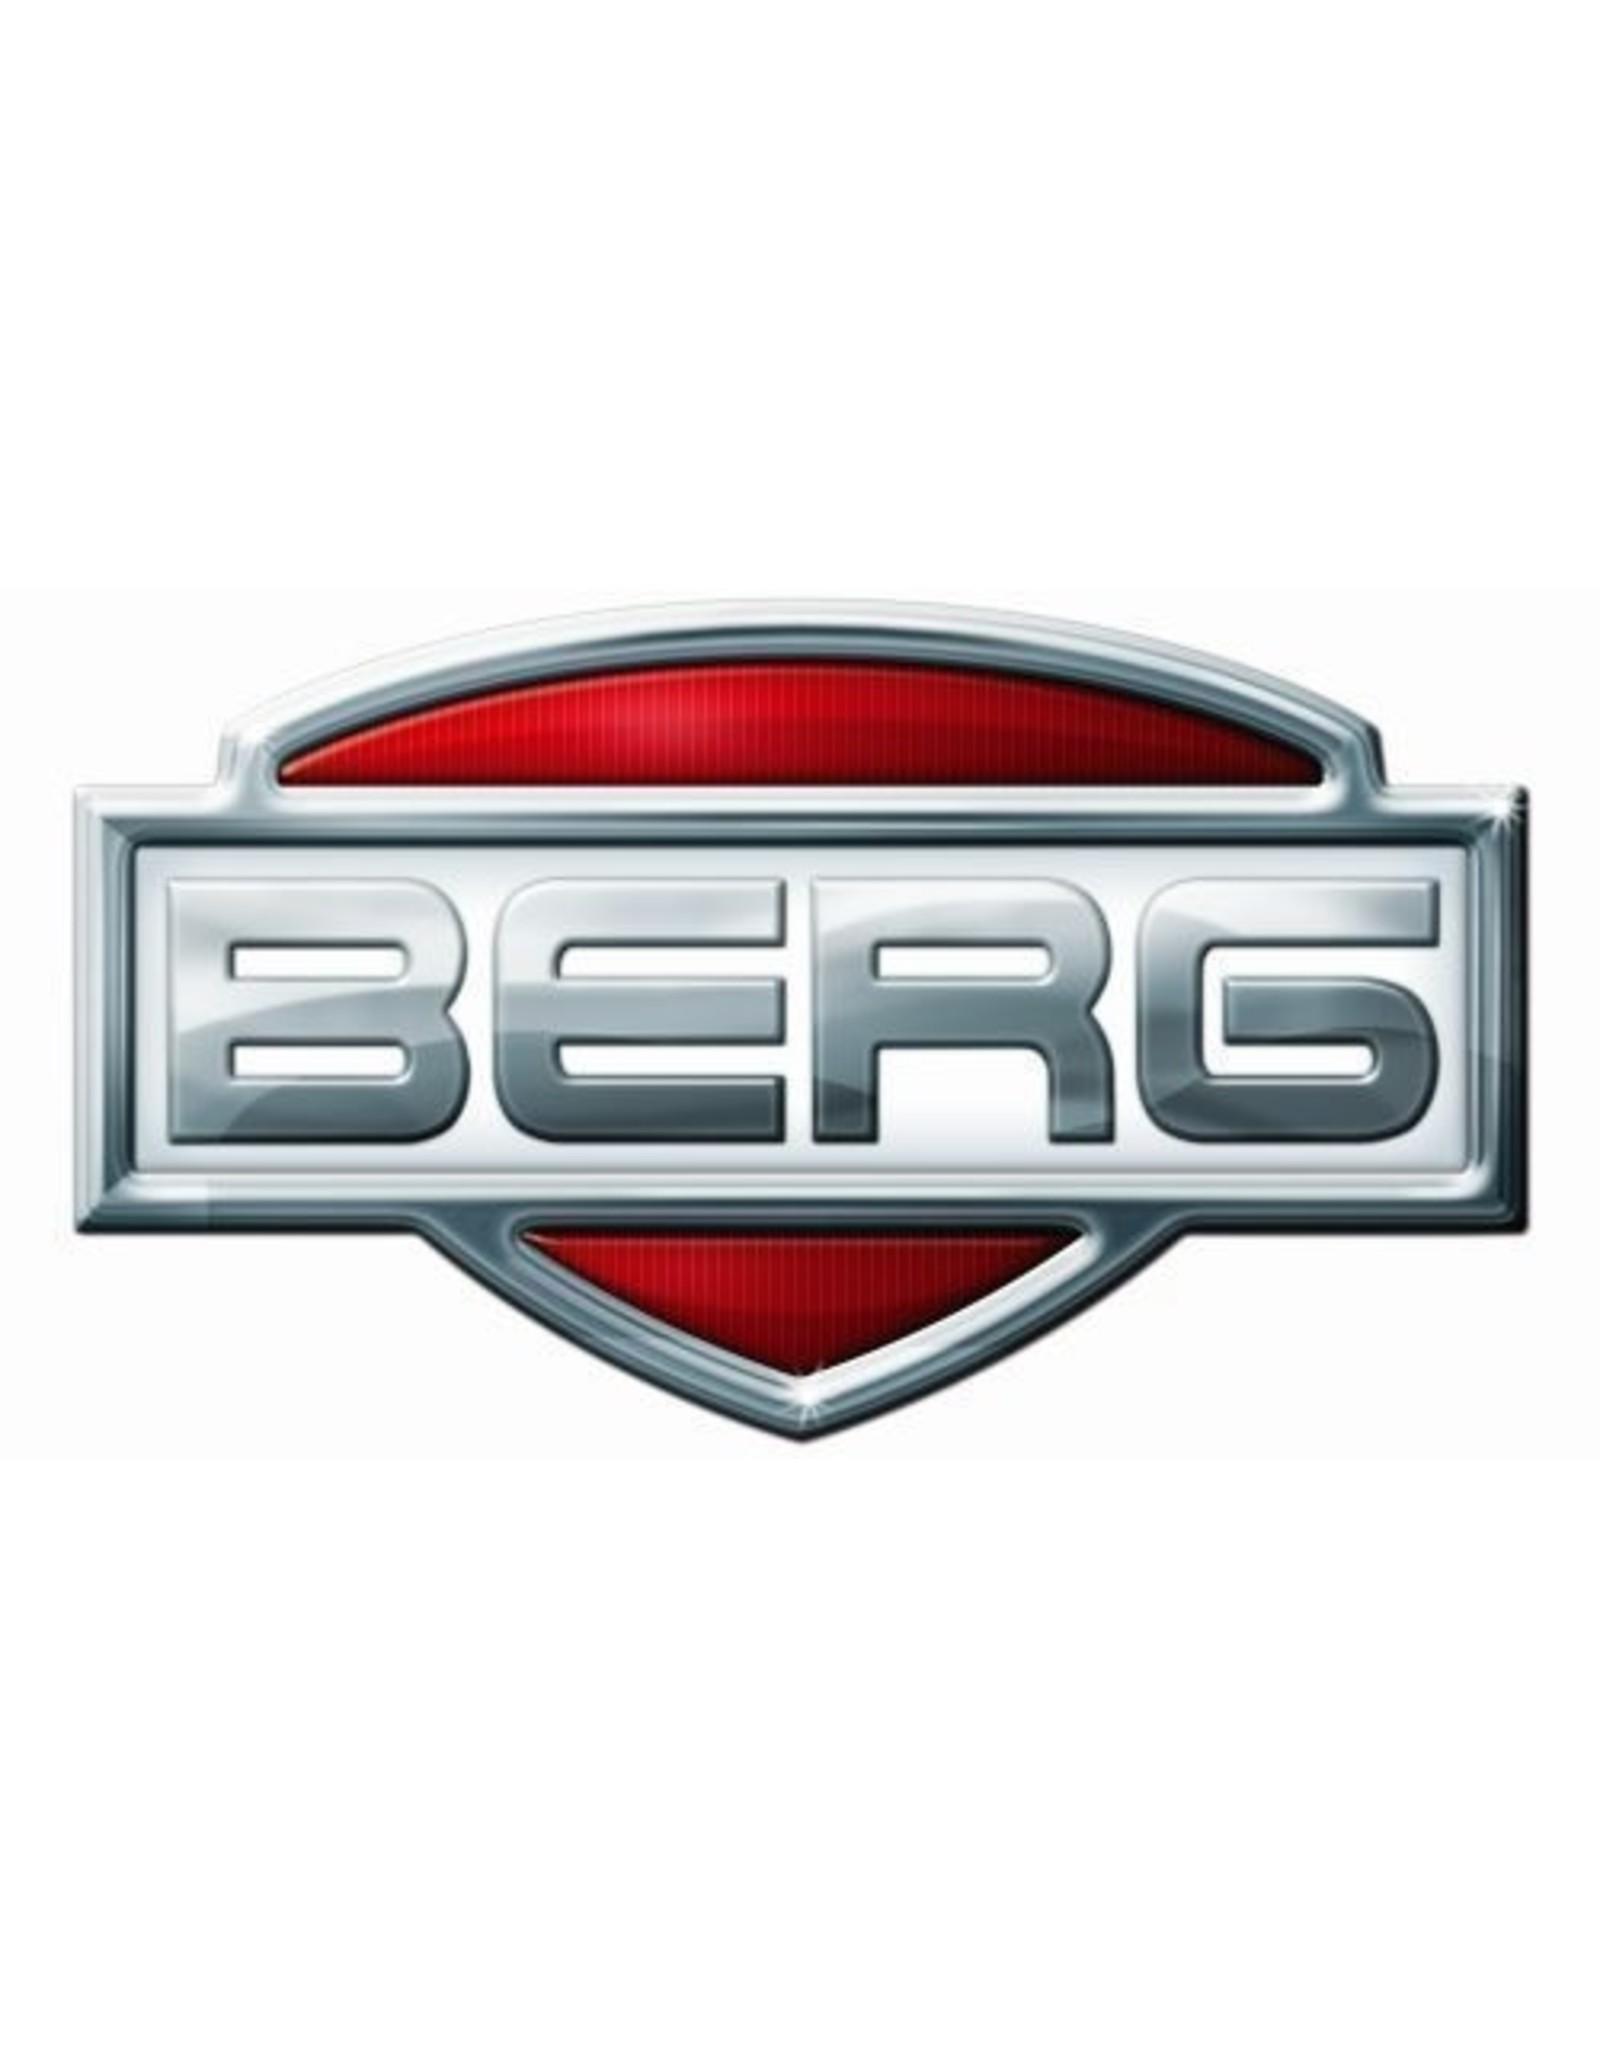 BERG BERG Buddy Rad schwarz 12.5x2.25-8 Slick